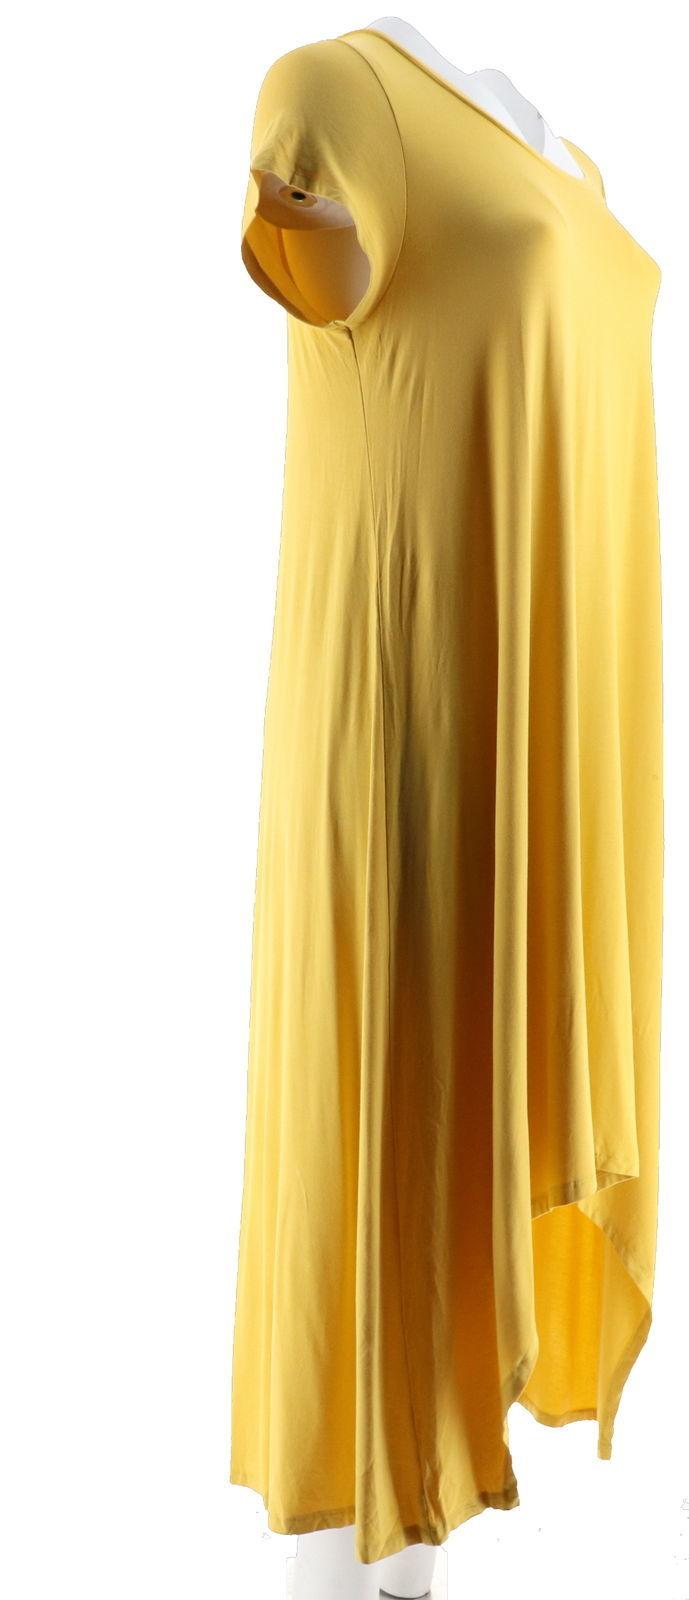 Halston Hi-Low Hem Short Slv ScoopNeck Knit Maxi Dress Chartreuse XS NEW A274136